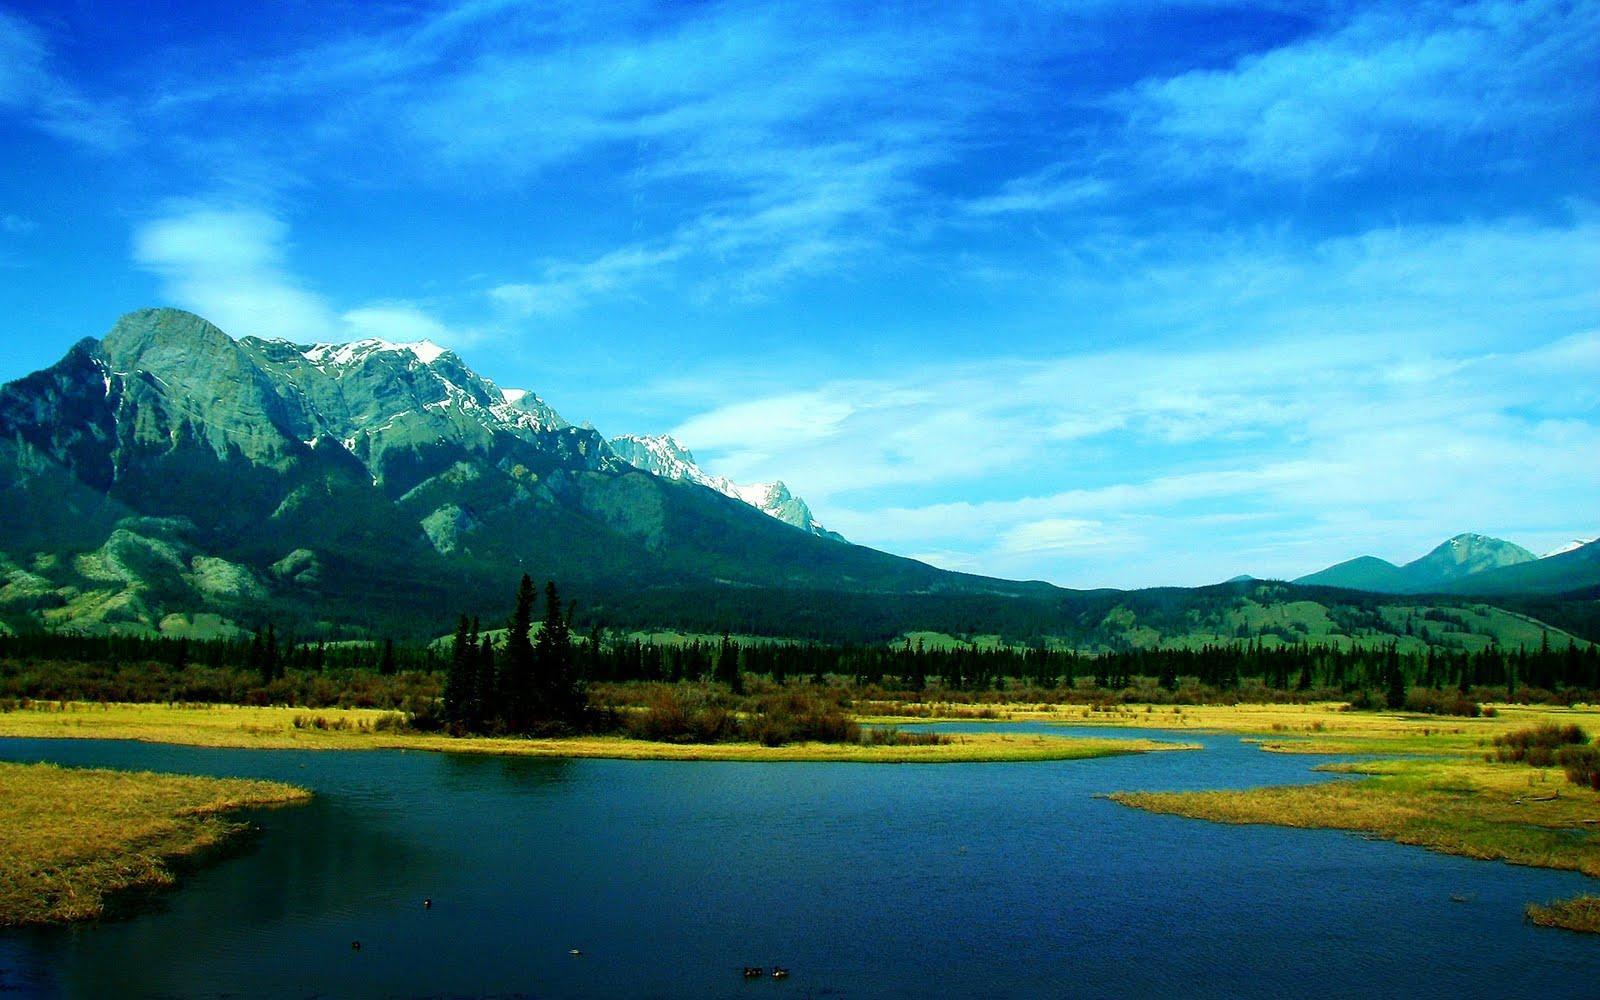 http://3.bp.blogspot.com/-5RStWoHkkO4/TdTBumC5qqI/AAAAAAAAAE8/CU6YSK5fAAc/s1600/beautiful_lake_wallpaper.jpg